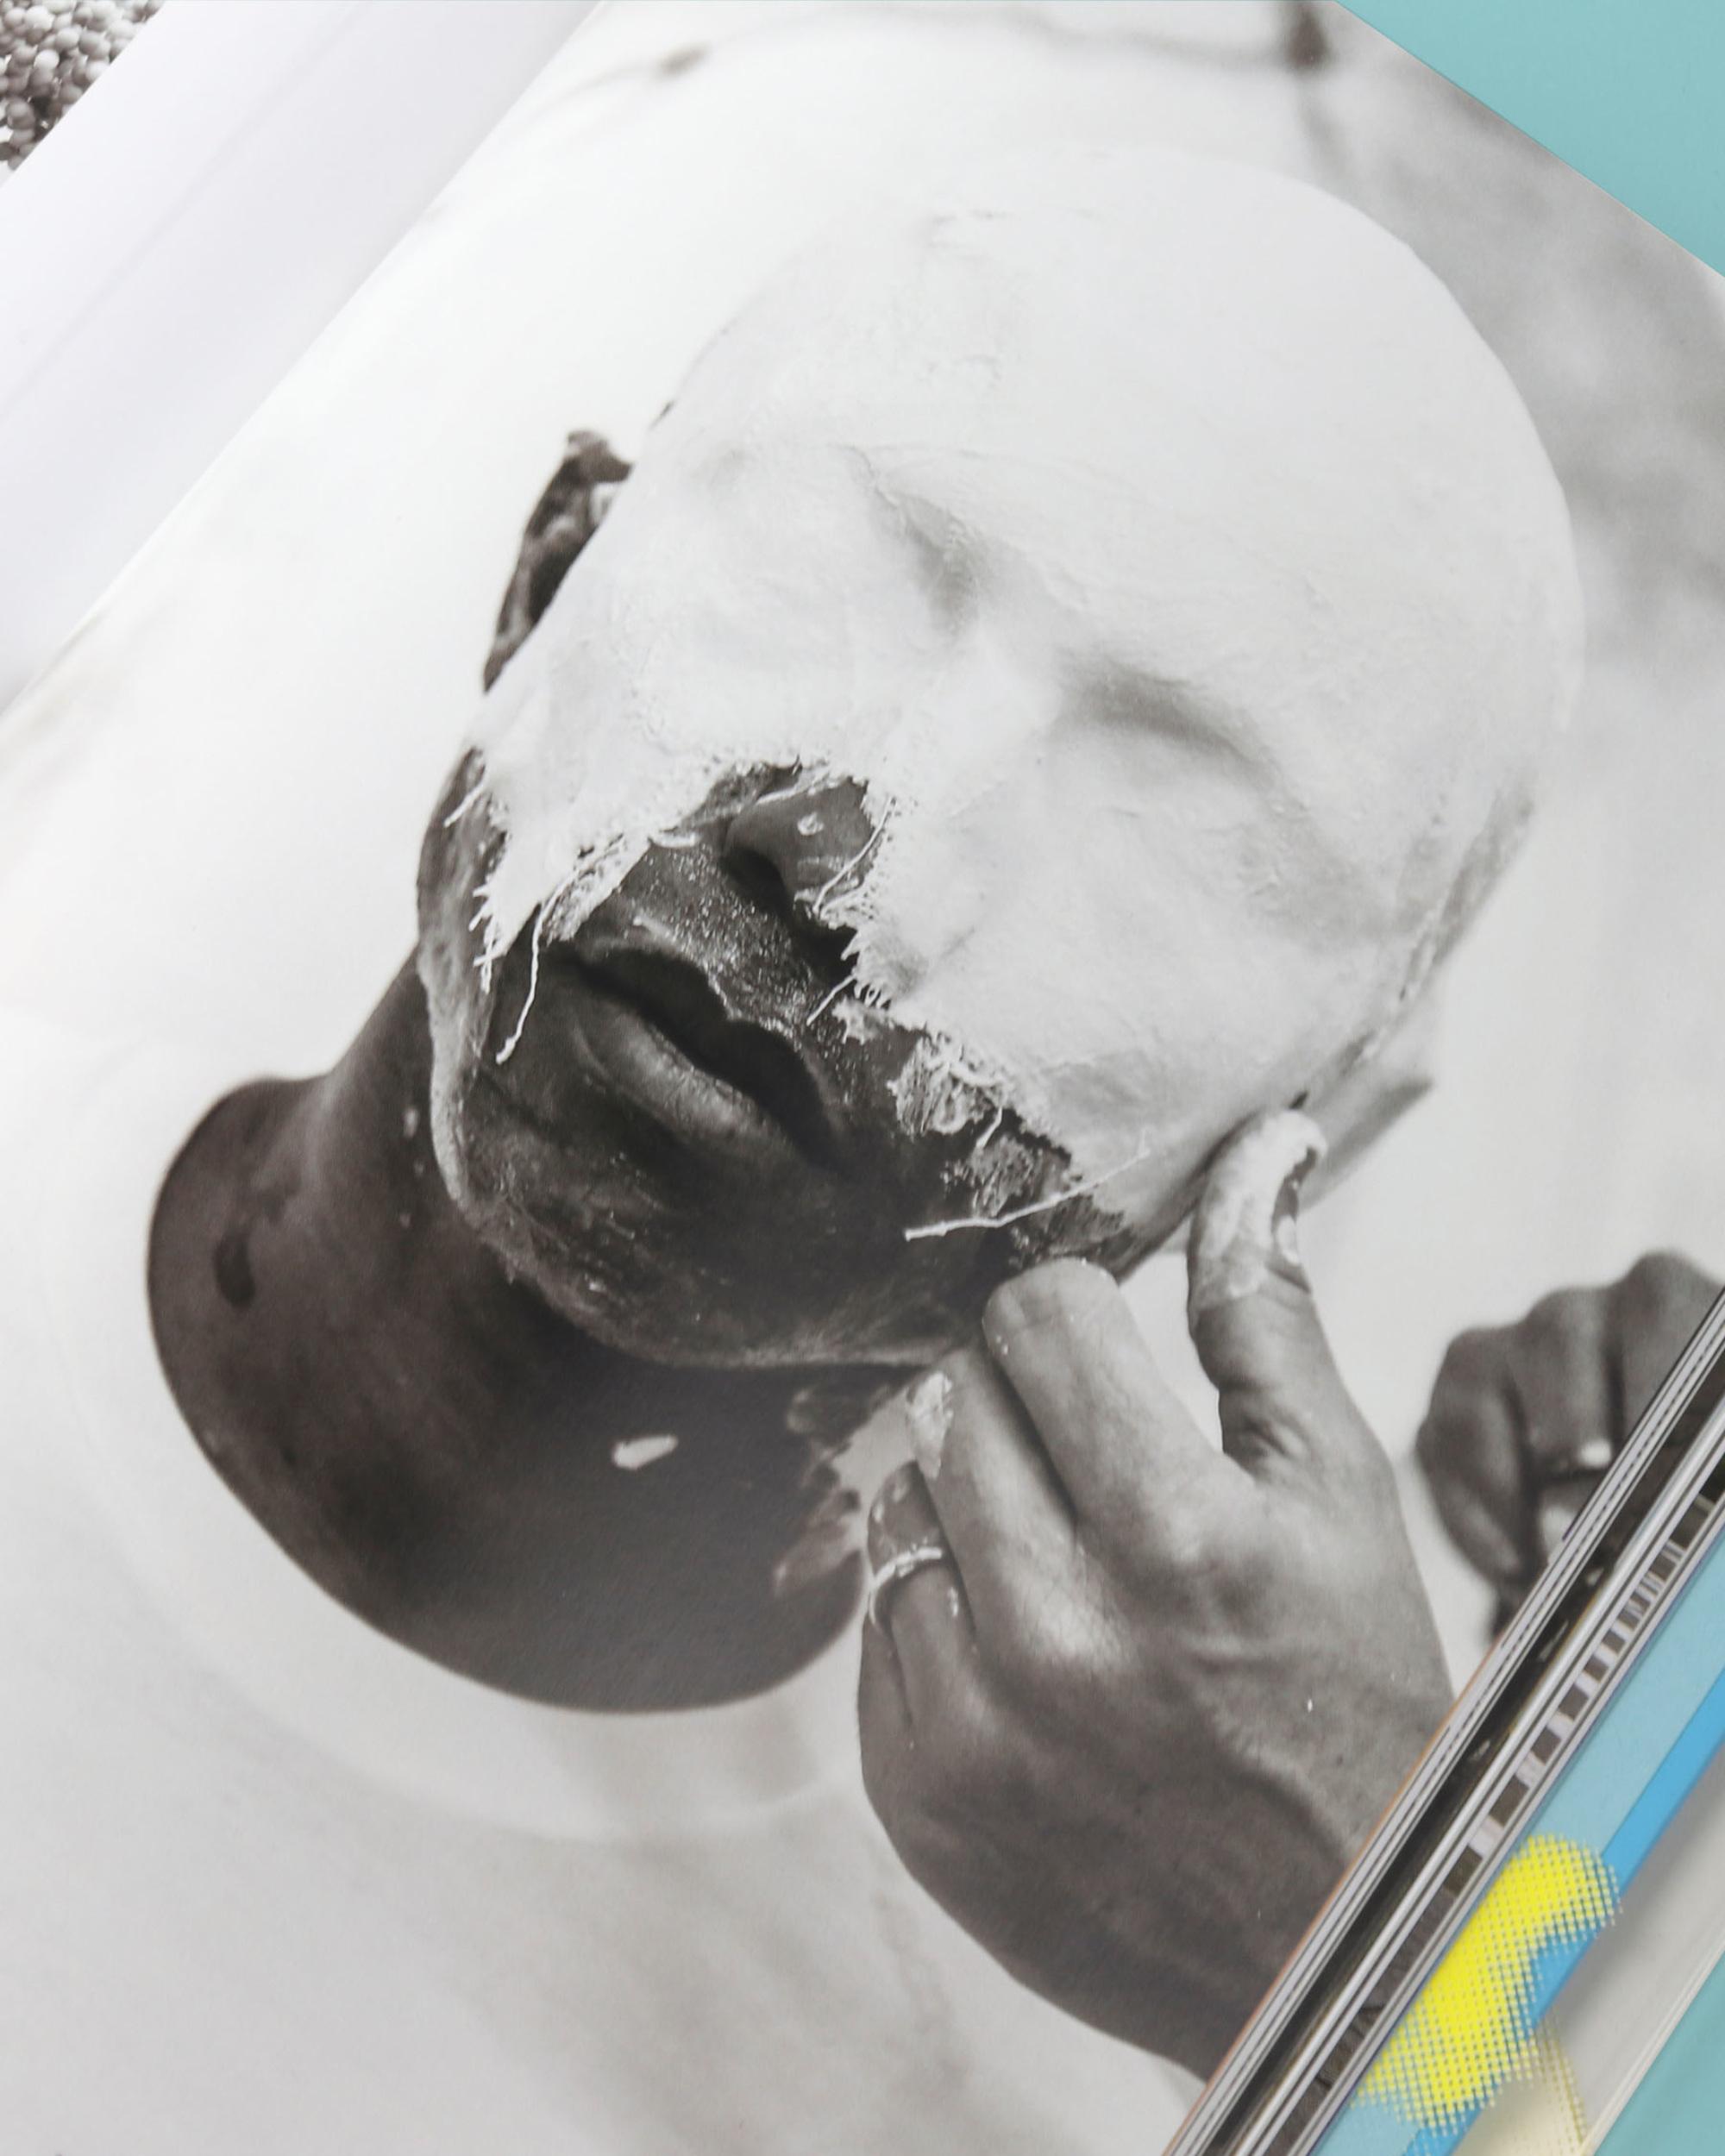 pharrell-mendo-book-13-2000x2500-c-default.jpg